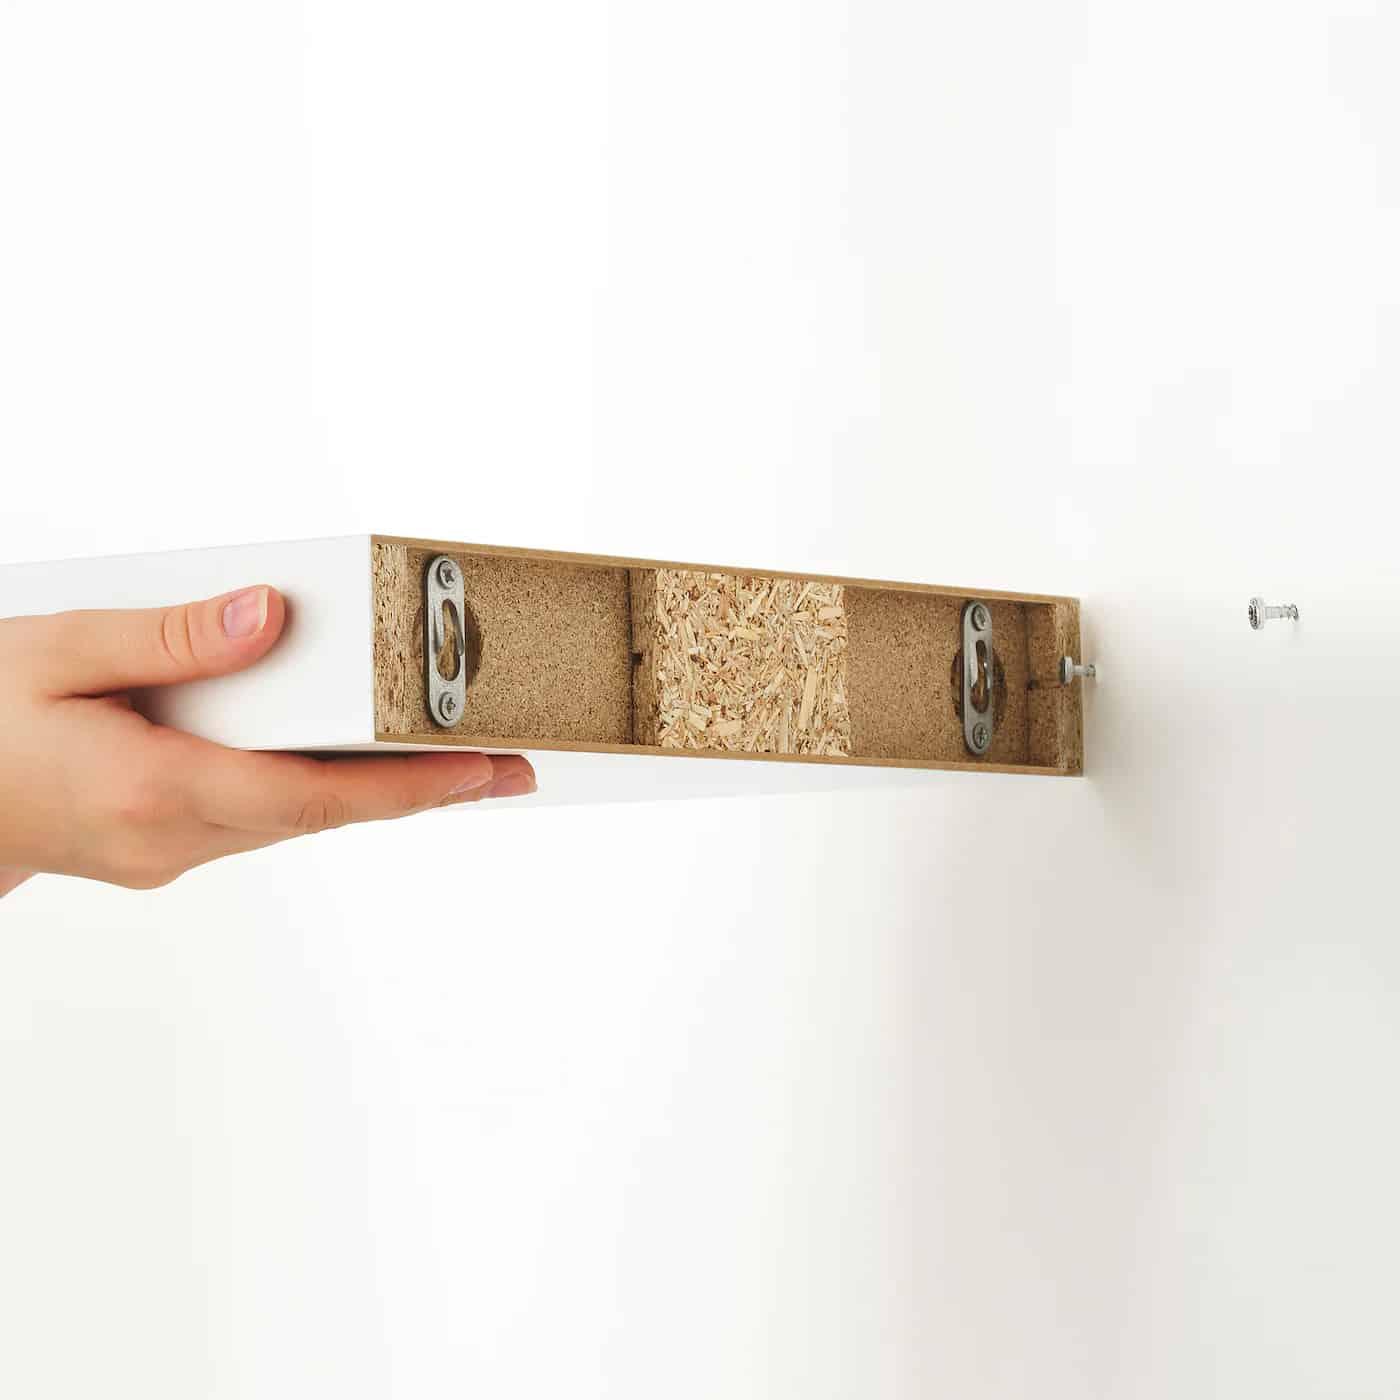 ikea white floating shelf back showing attached brackets